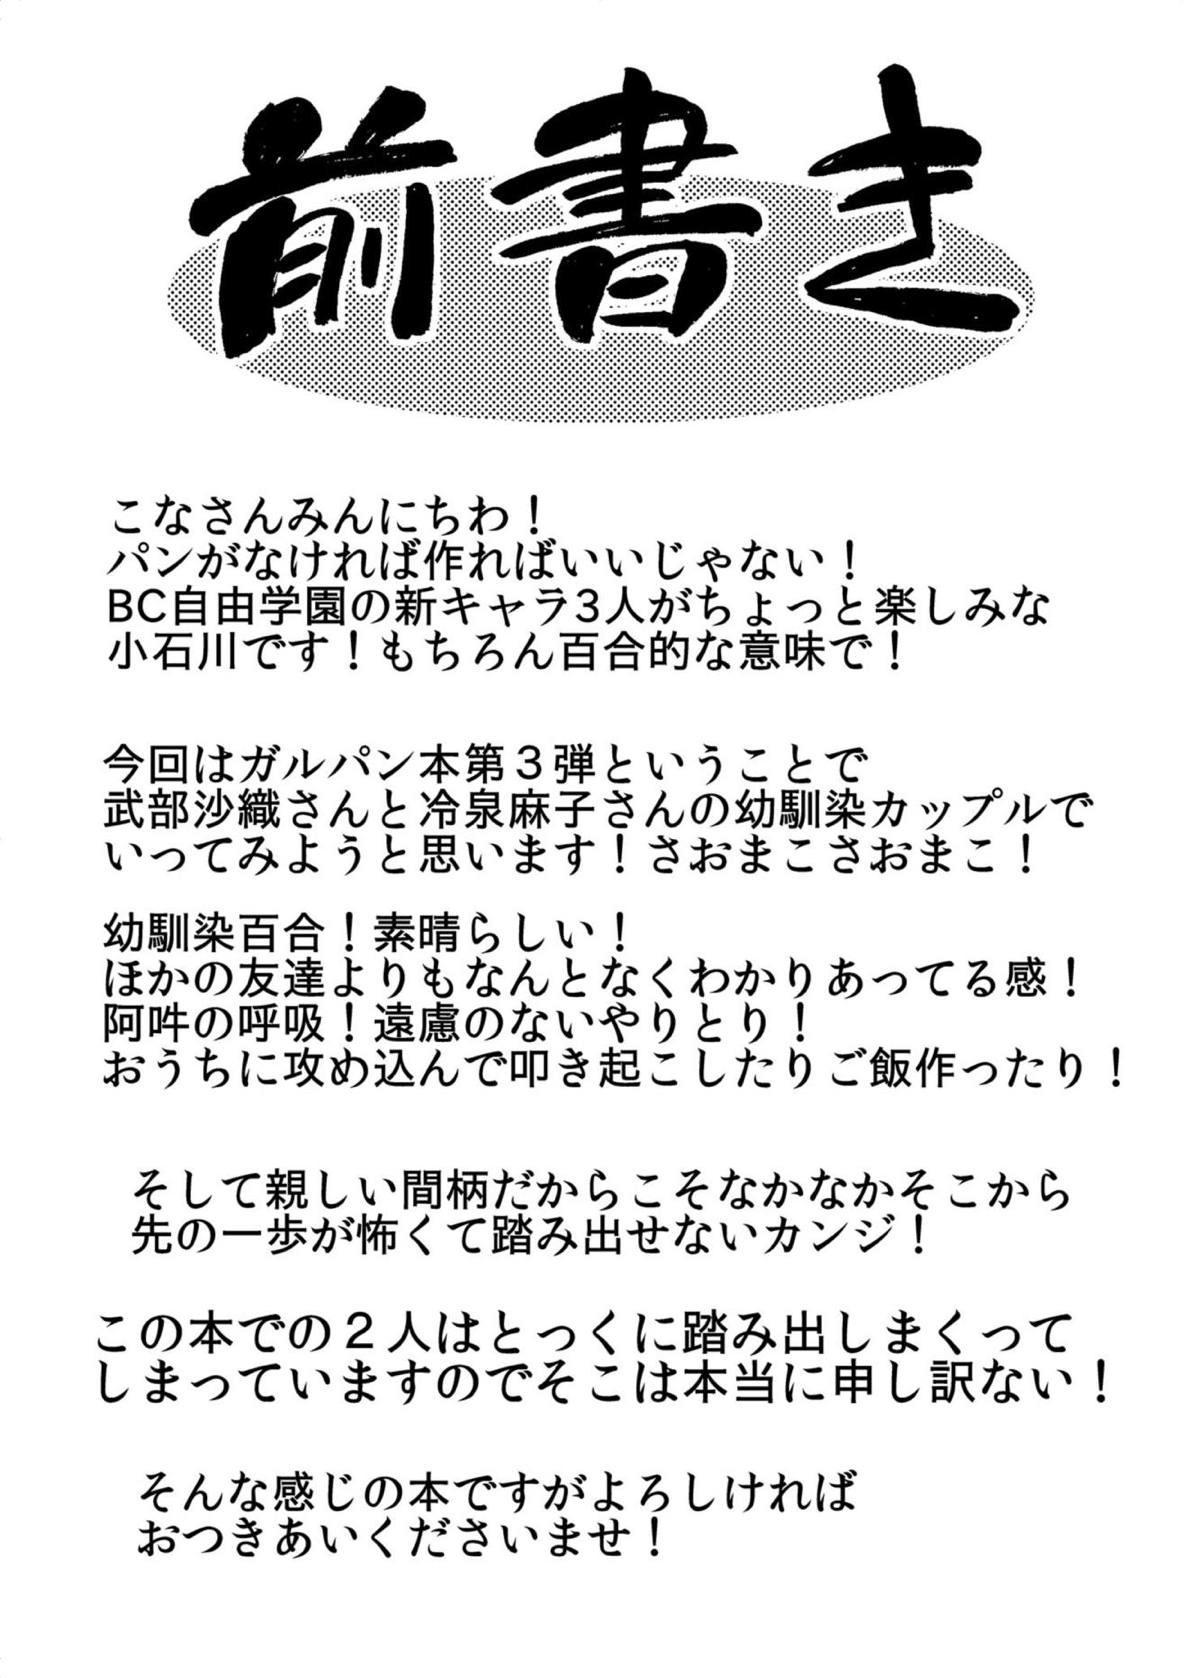 [Syamisen Koubou (Koishikawa)] Girls und Girls 3 ~SaoMako Sakusen desu!~   Girls und Girls 3 ~It's the SaoMako strategy!~ (Girls und Panzer) [English] {/u/ Scanlations} [Digital] 2